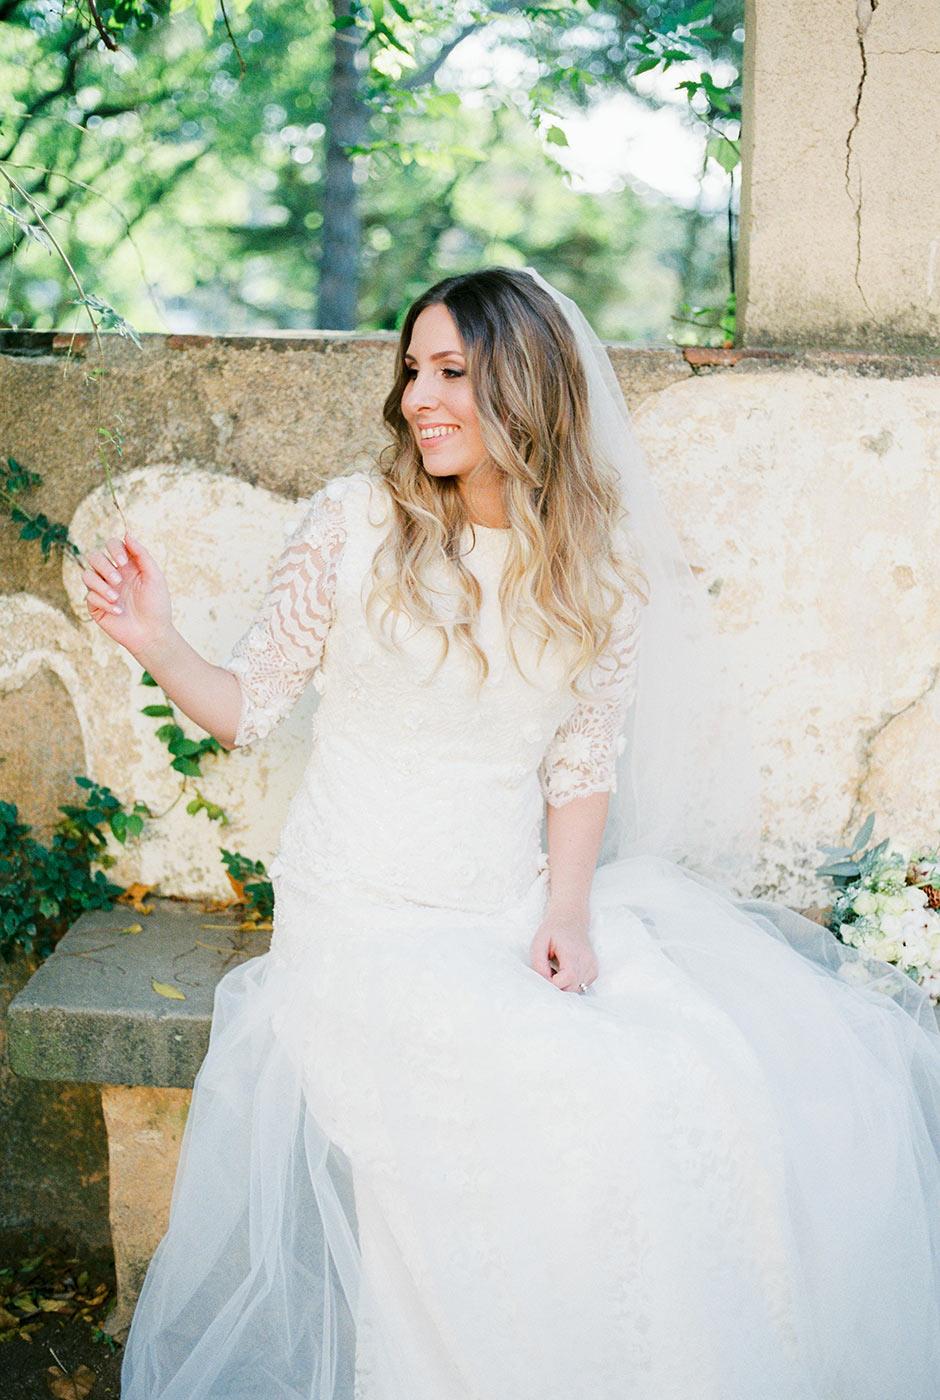 Bride's photoshoot Barcelona | Fine Art Photographer | Lena Karelova Photography | Destination Wedding Photographer Barcelona |Film Wedding Photographer